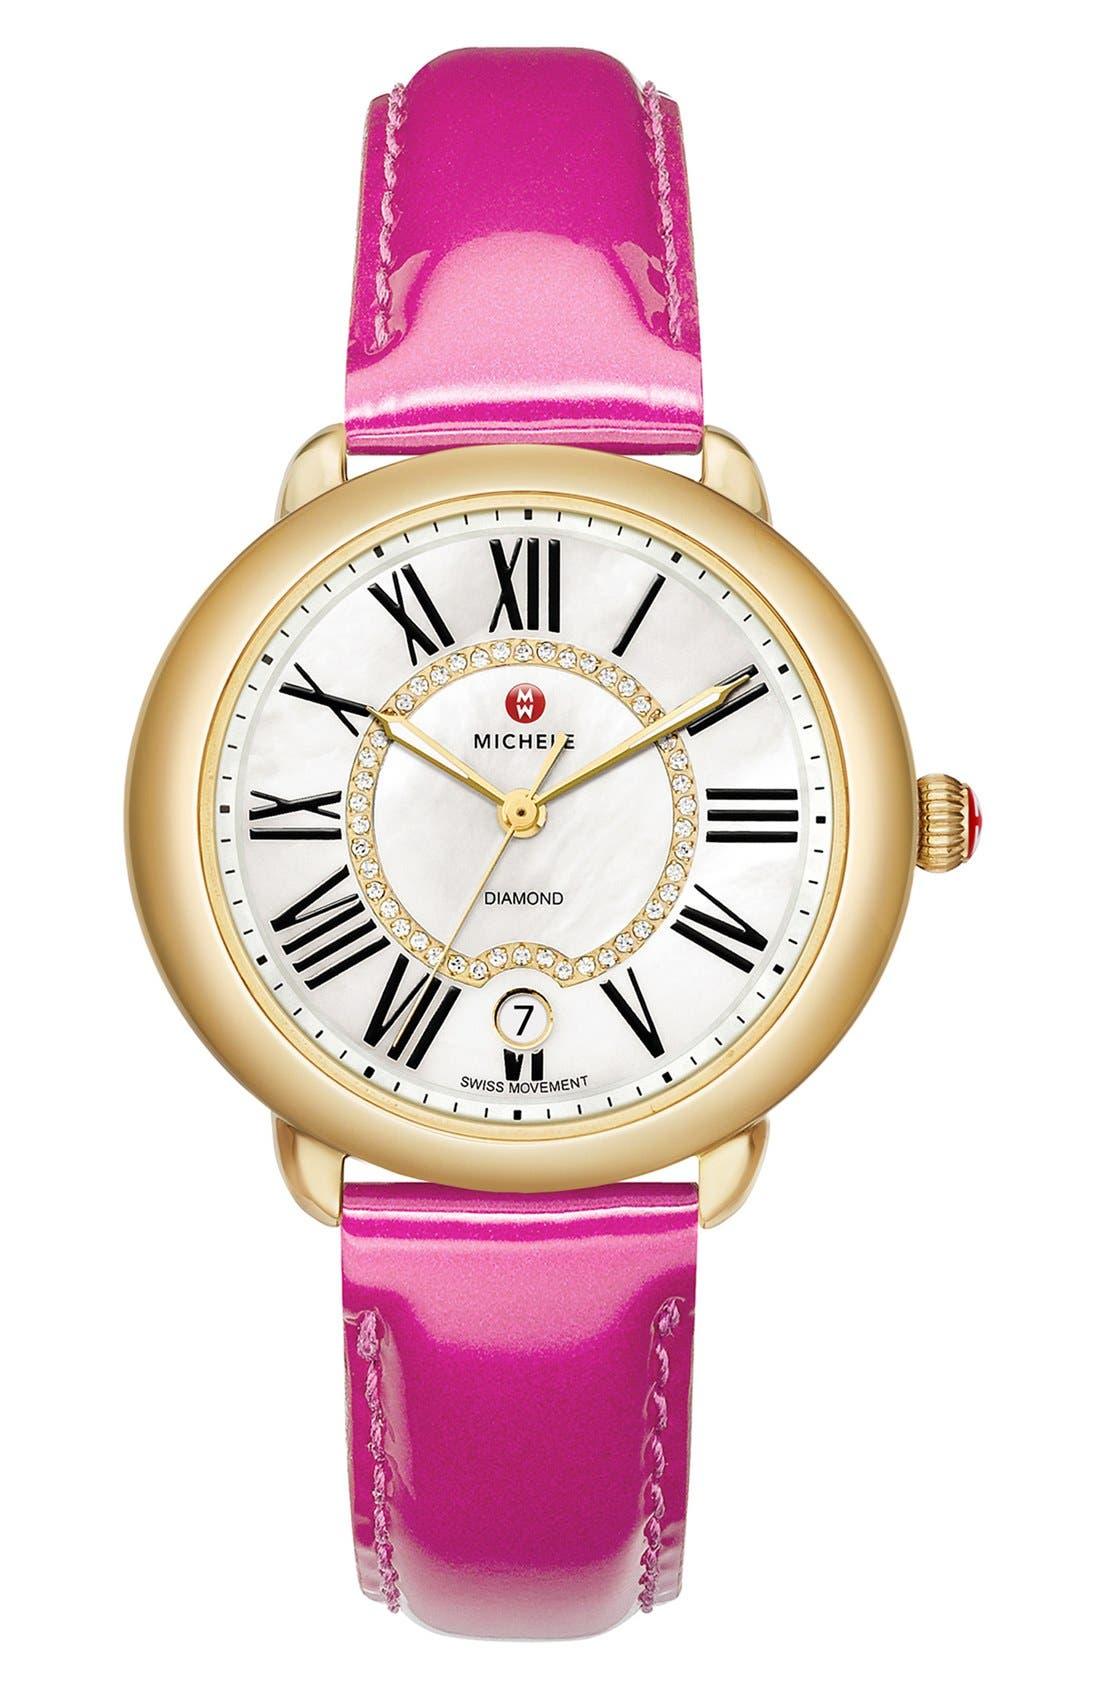 Serein 16 Diamond Dial Watch Head, 34mm x 36mm,                             Alternate thumbnail 5, color,                             GOLD